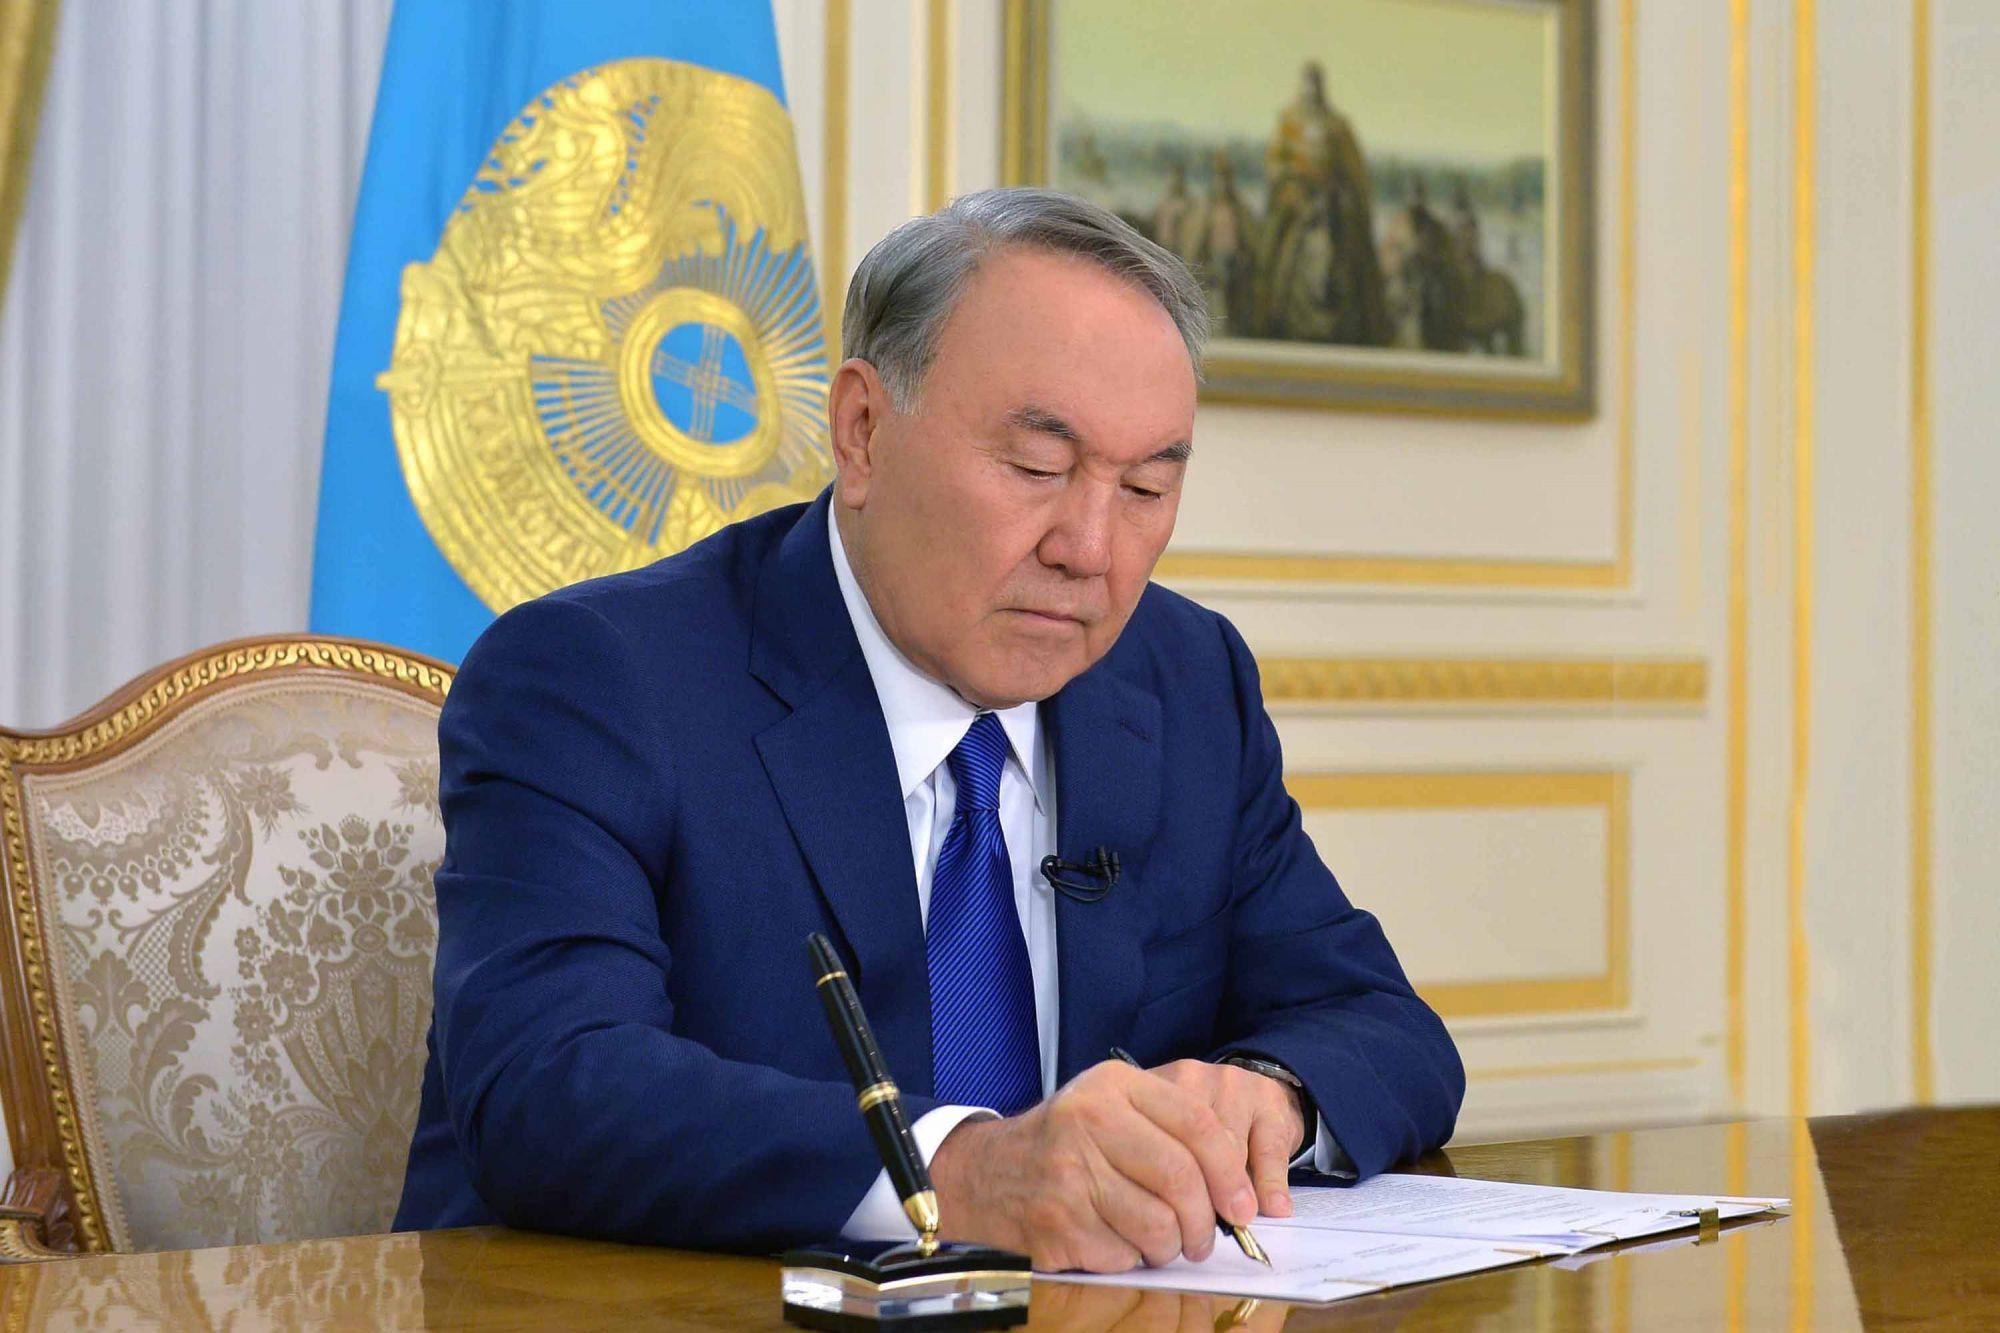 Нурсултан Назарбаев подписал закон о гарантированном трансферте из Нацфонда РК на 2019-2021 годы